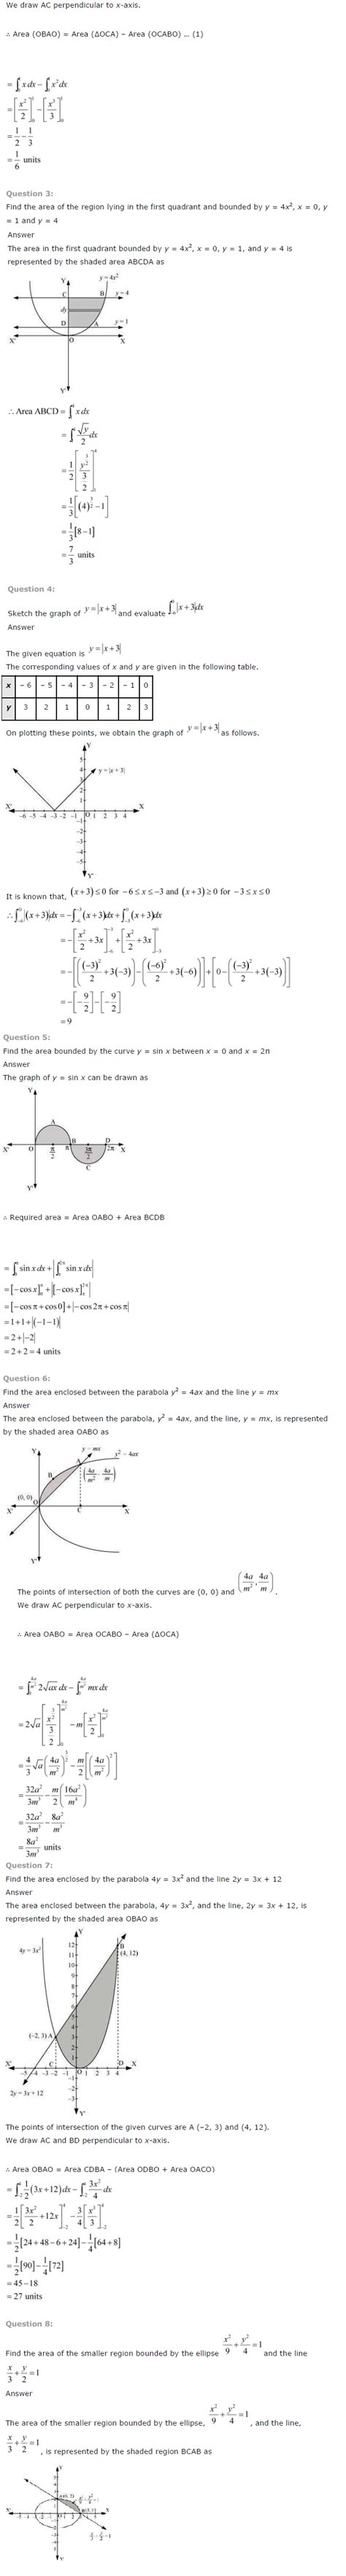 ncert solutions for class 12 maths chapter 8 application